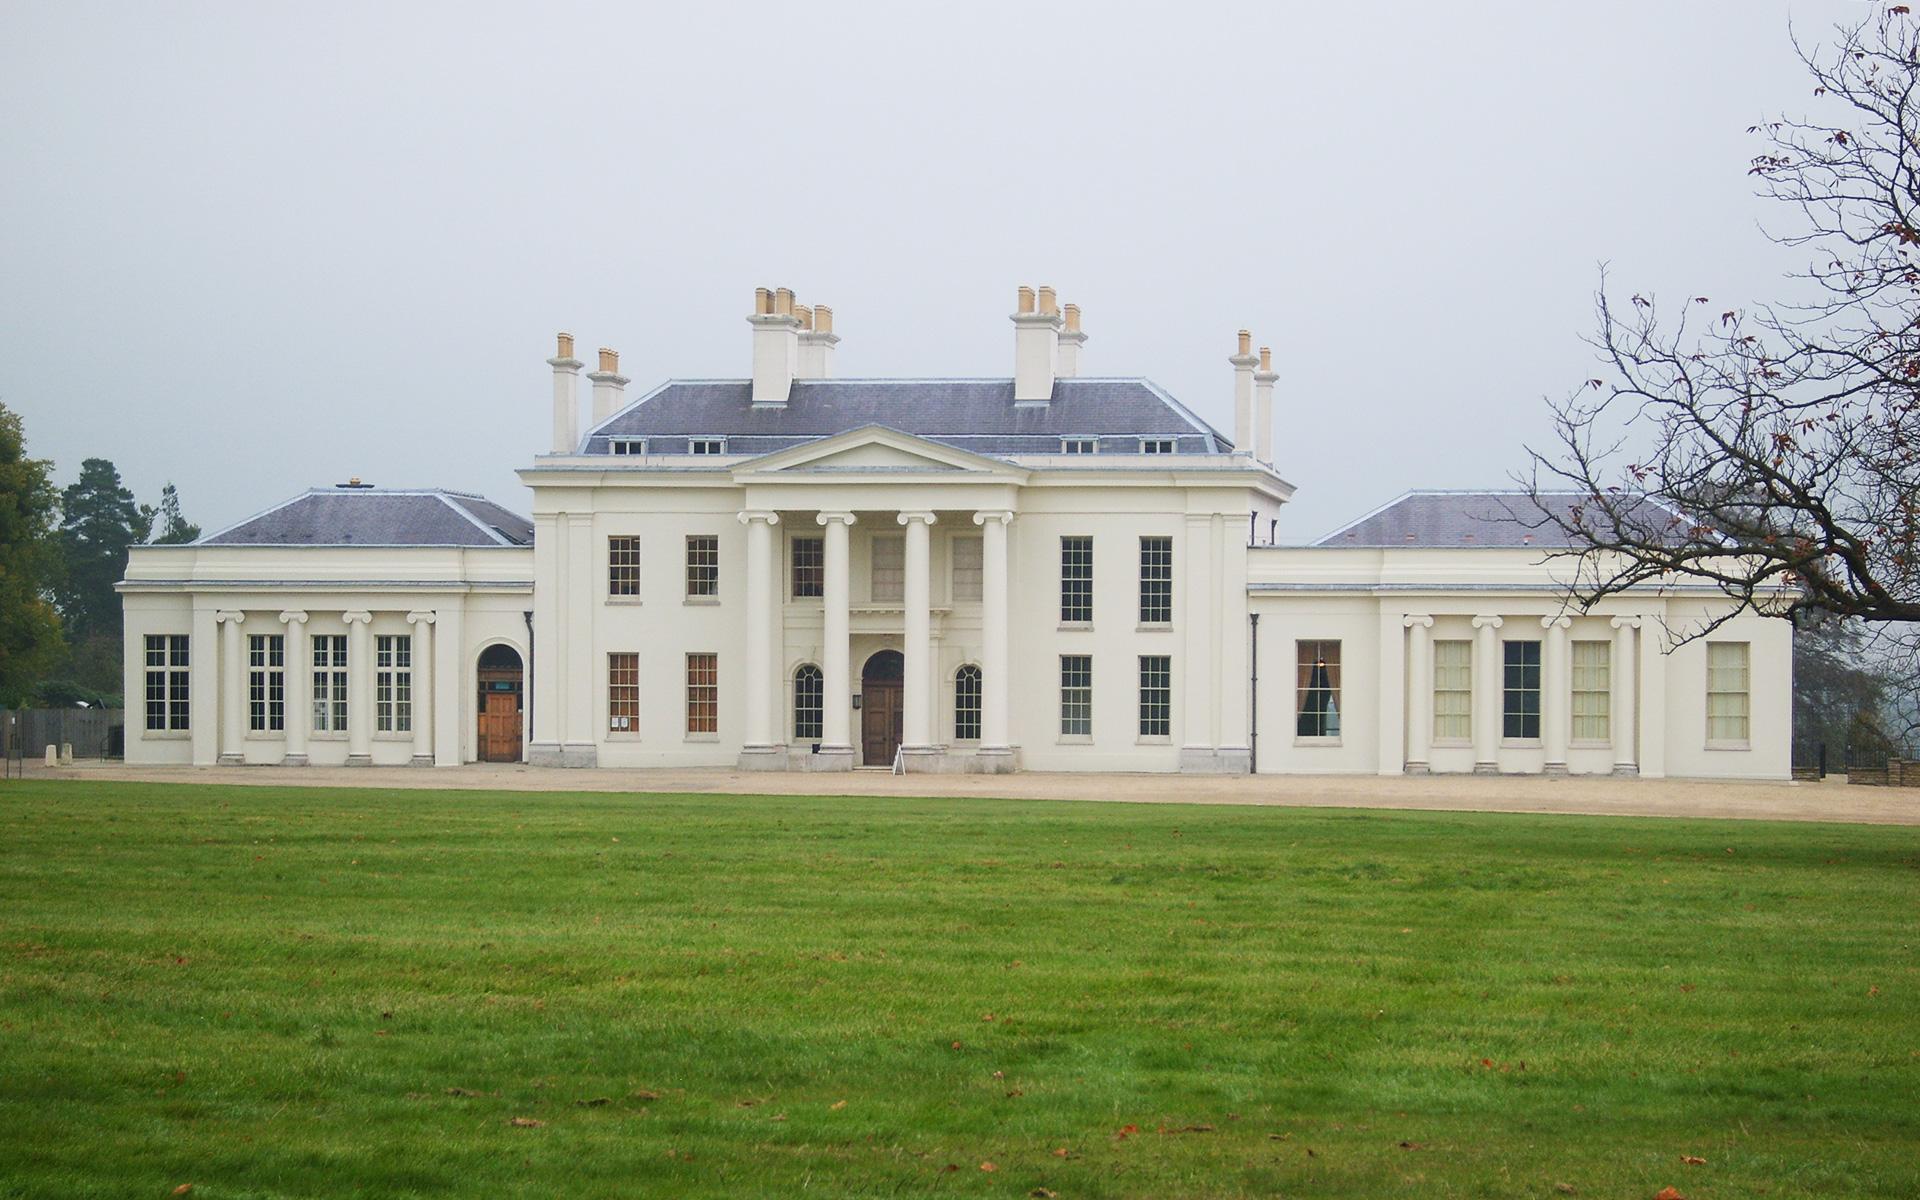 Bakers of Danbury - Hylands House